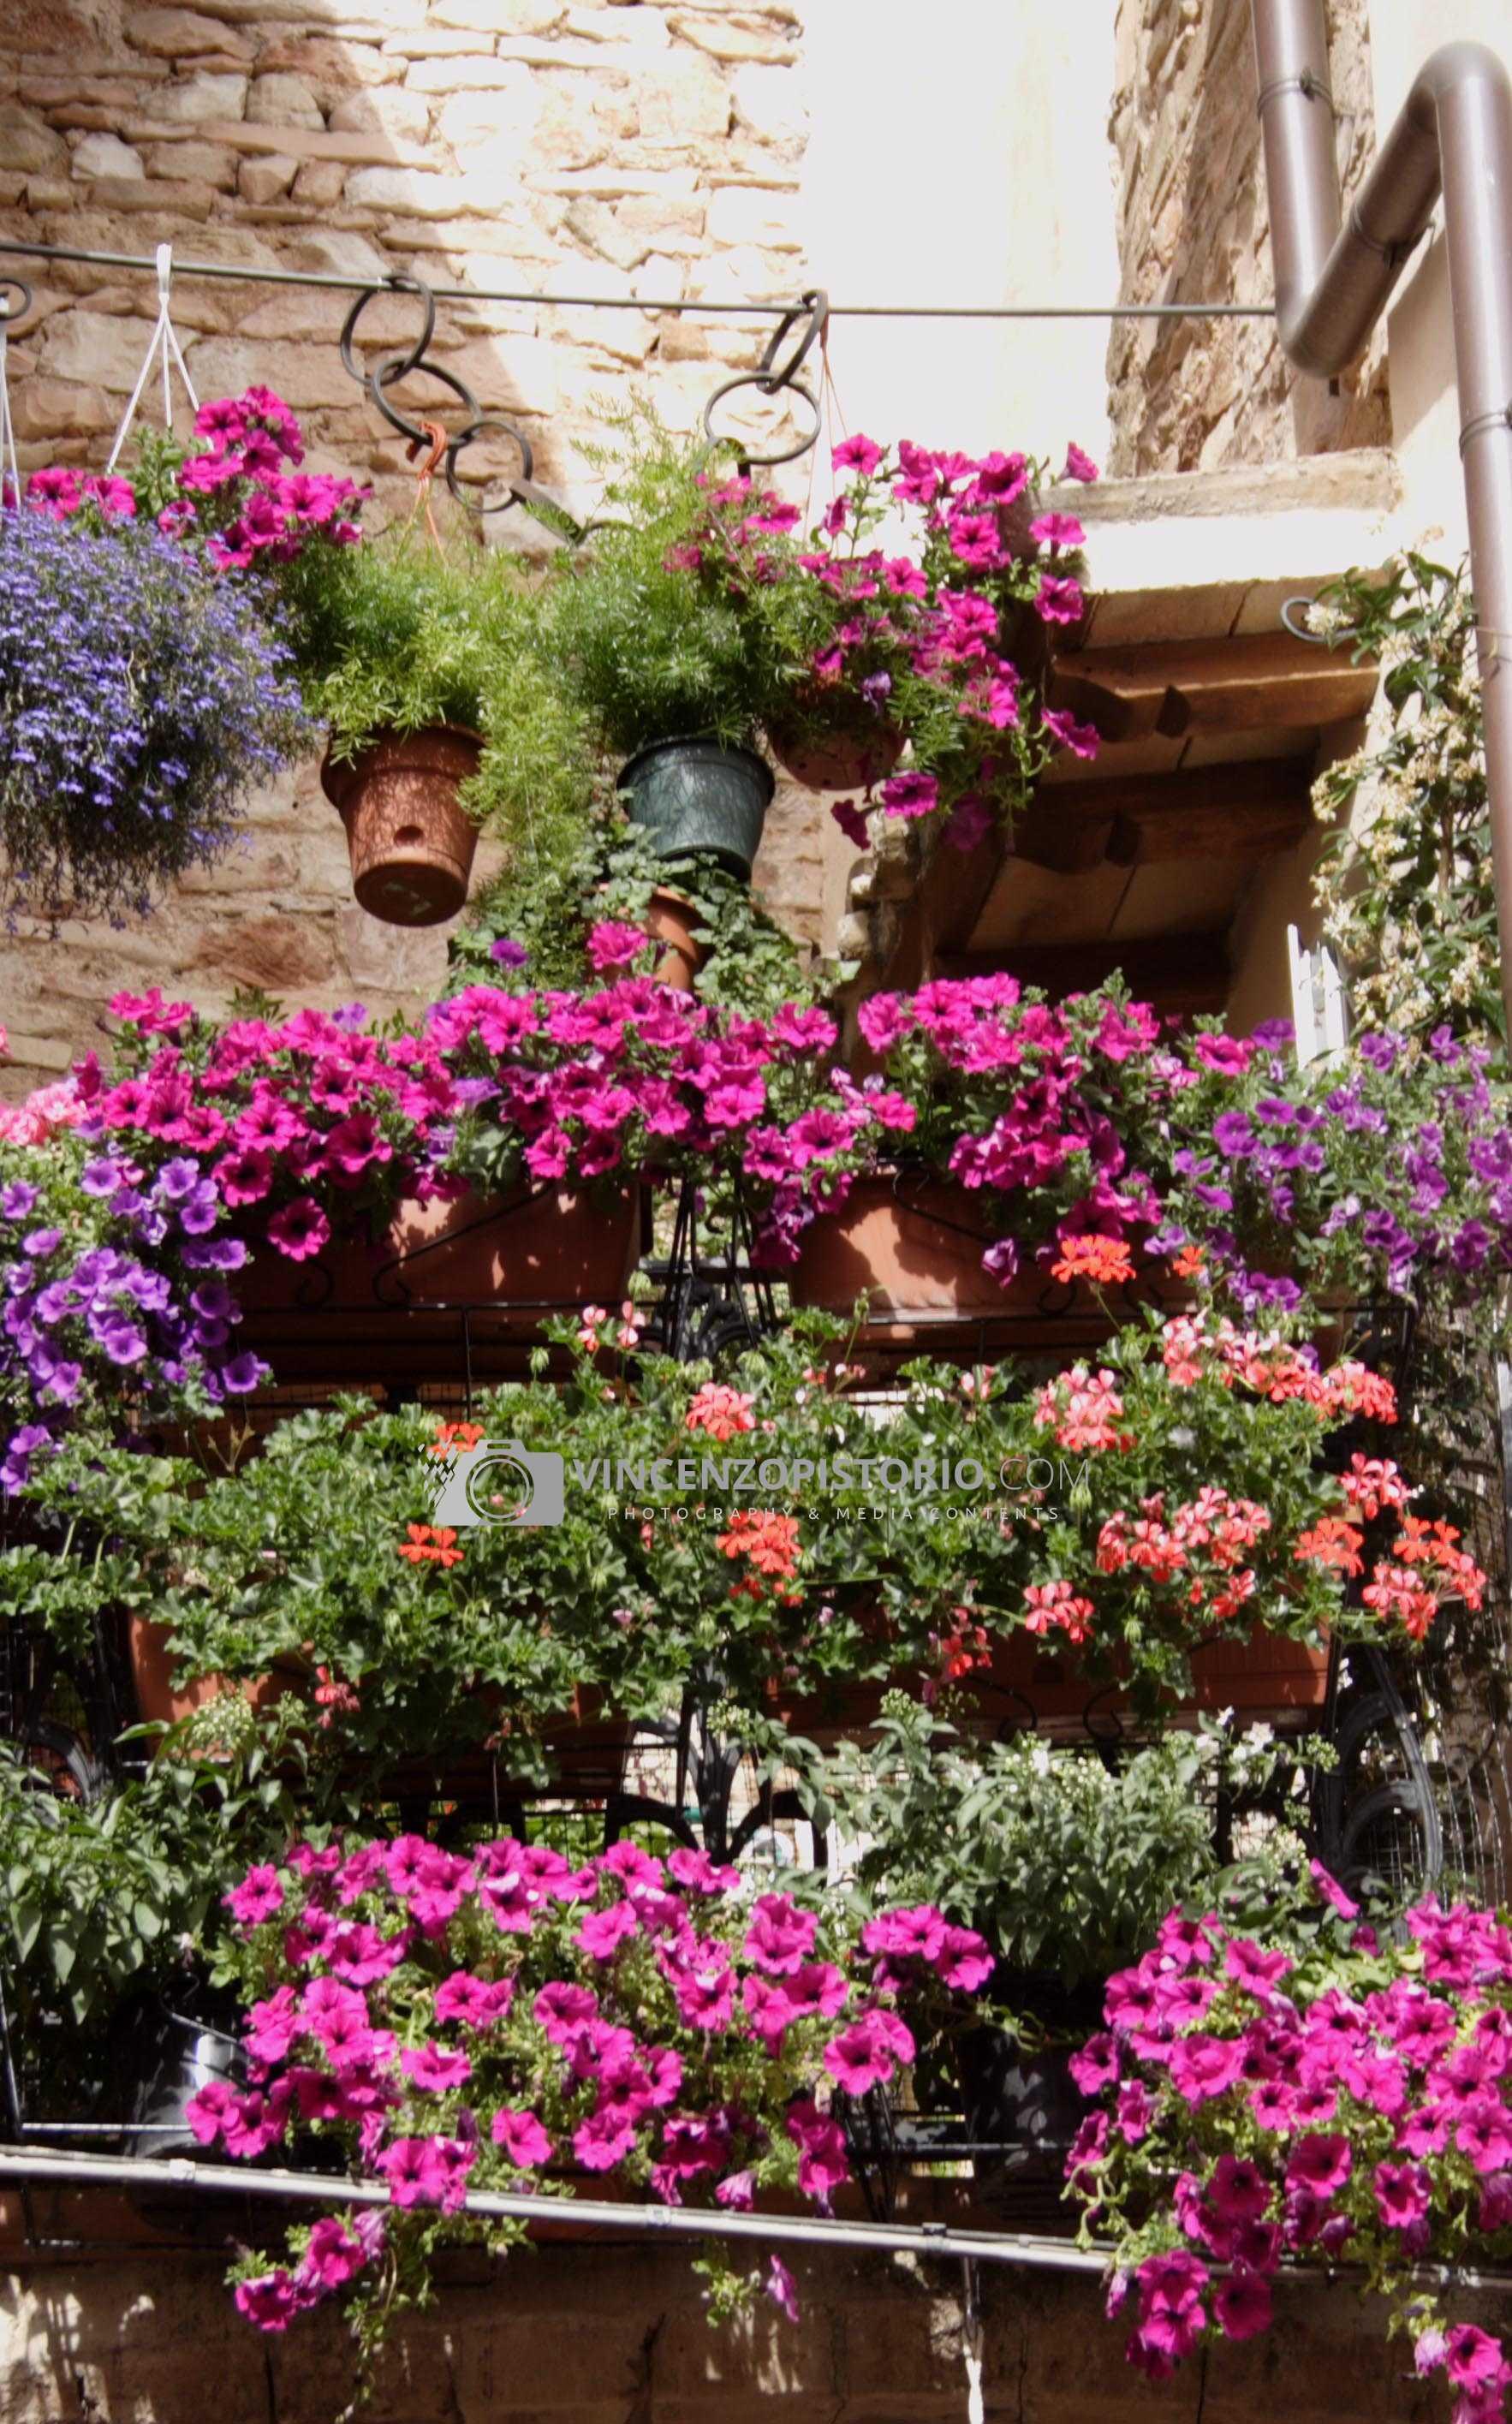 Triumph of flowers on balcony